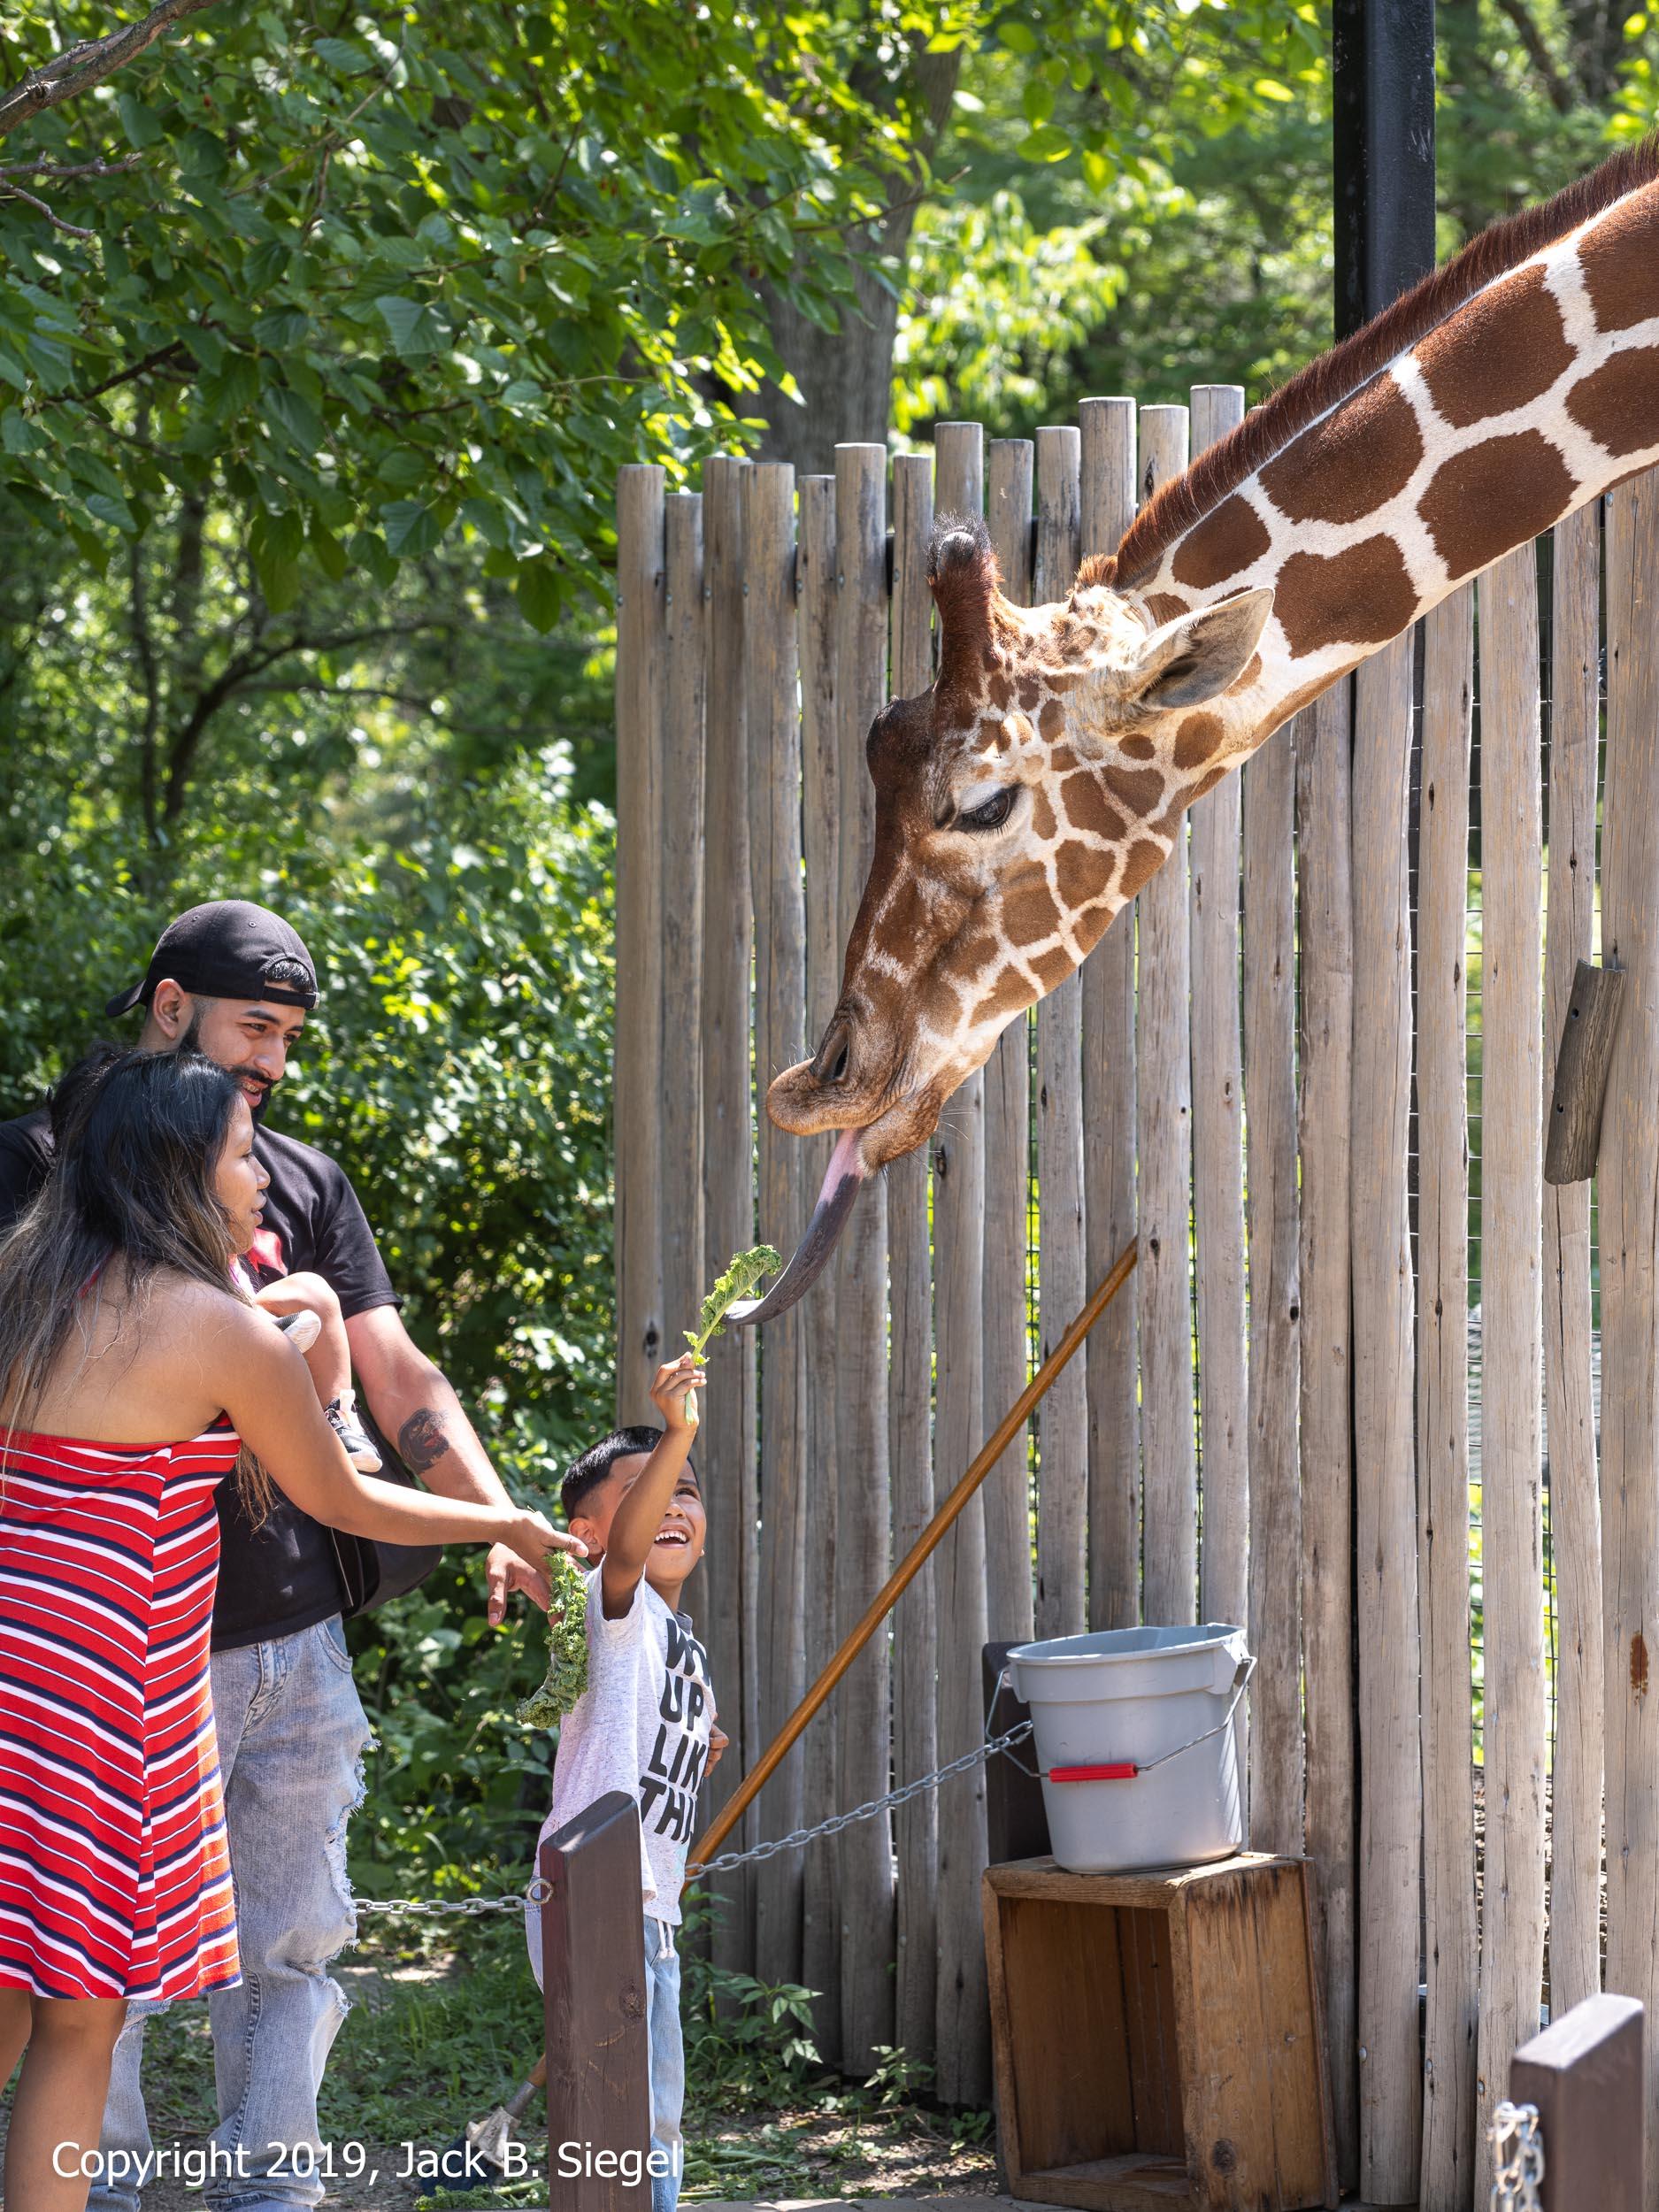 _DSF4639_Copyright 2018 jpeg_Kale for a Giraffe.jpg